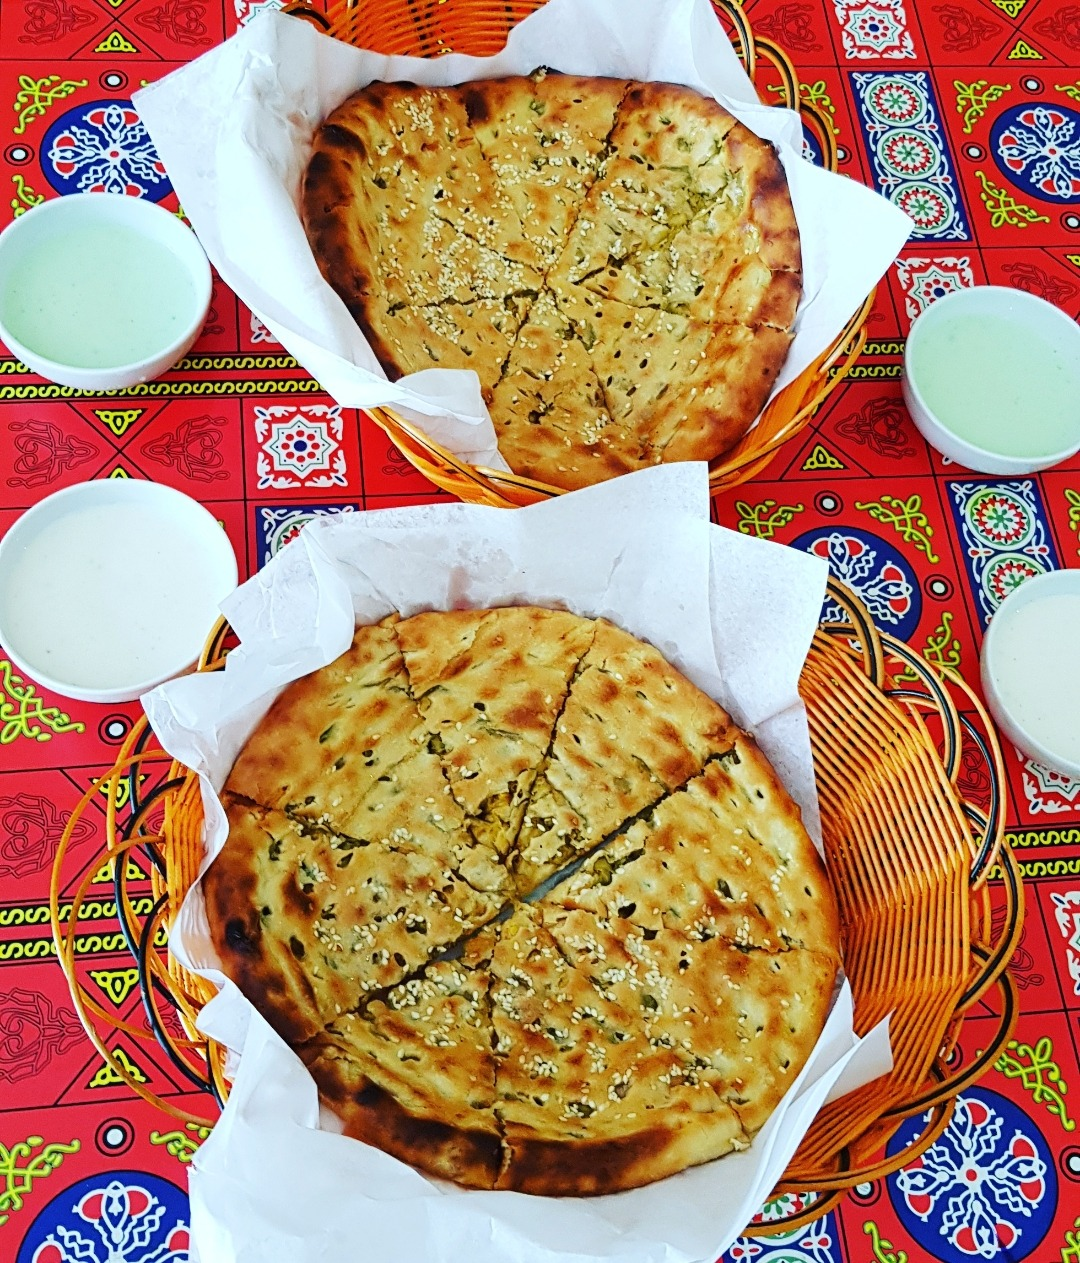 La Cucina - Bahrain